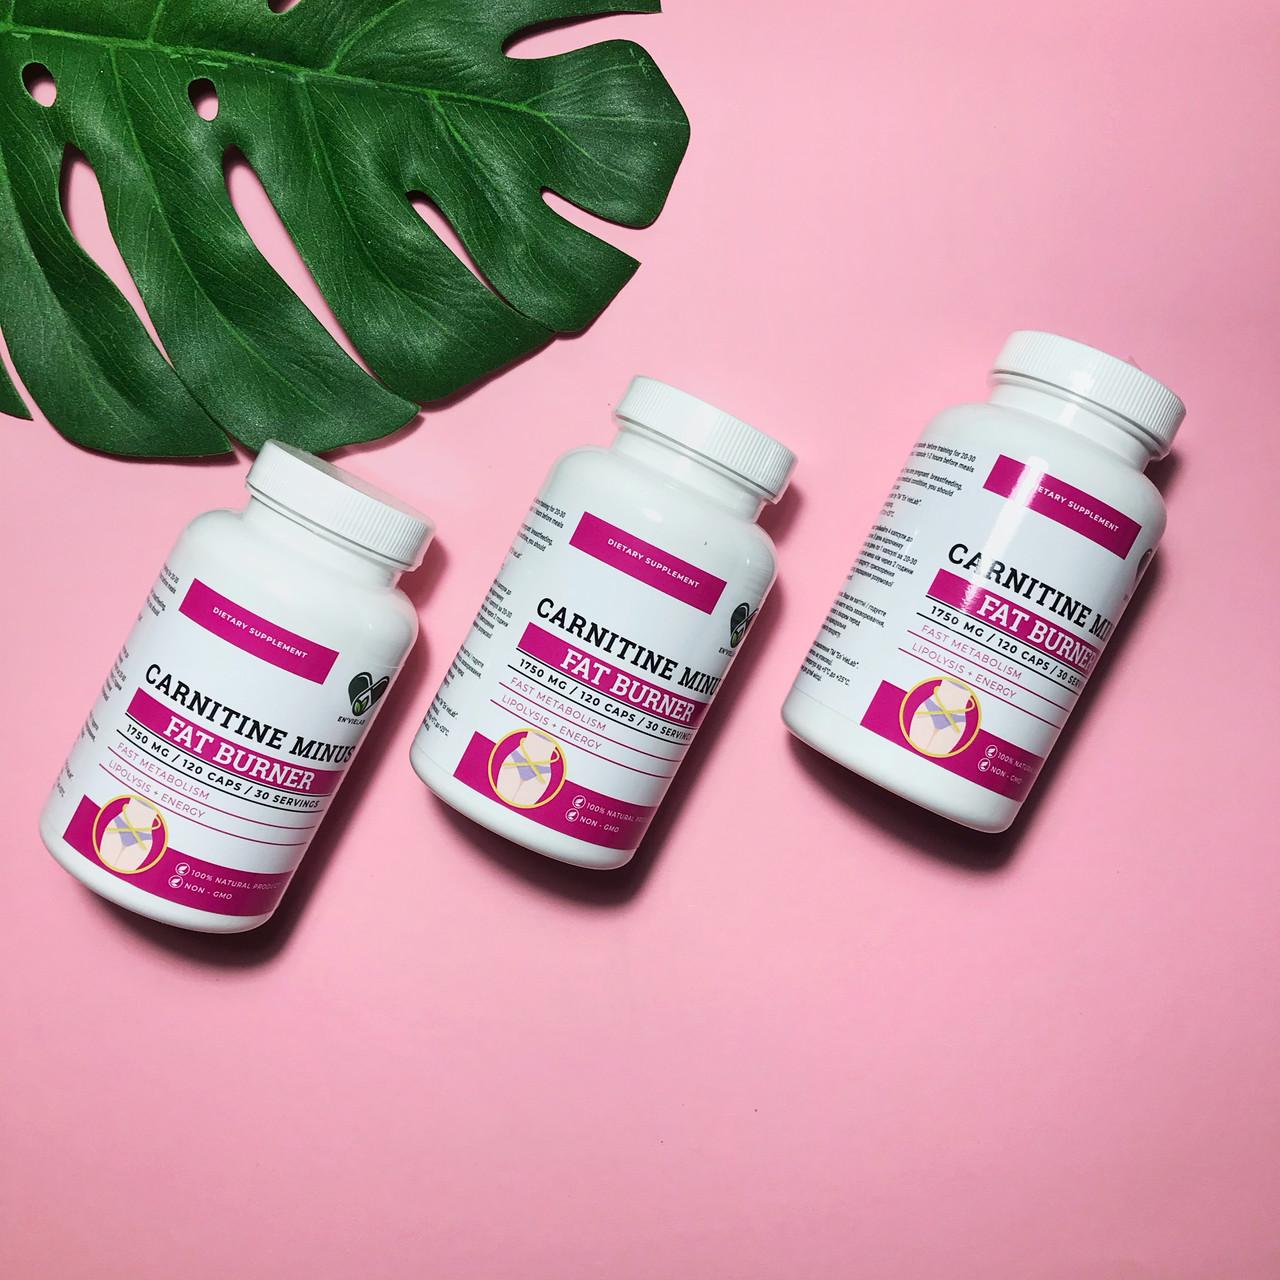 L-Карнитин для похудения 1500 mg. Carnitine MINUS от ENVIE LAB